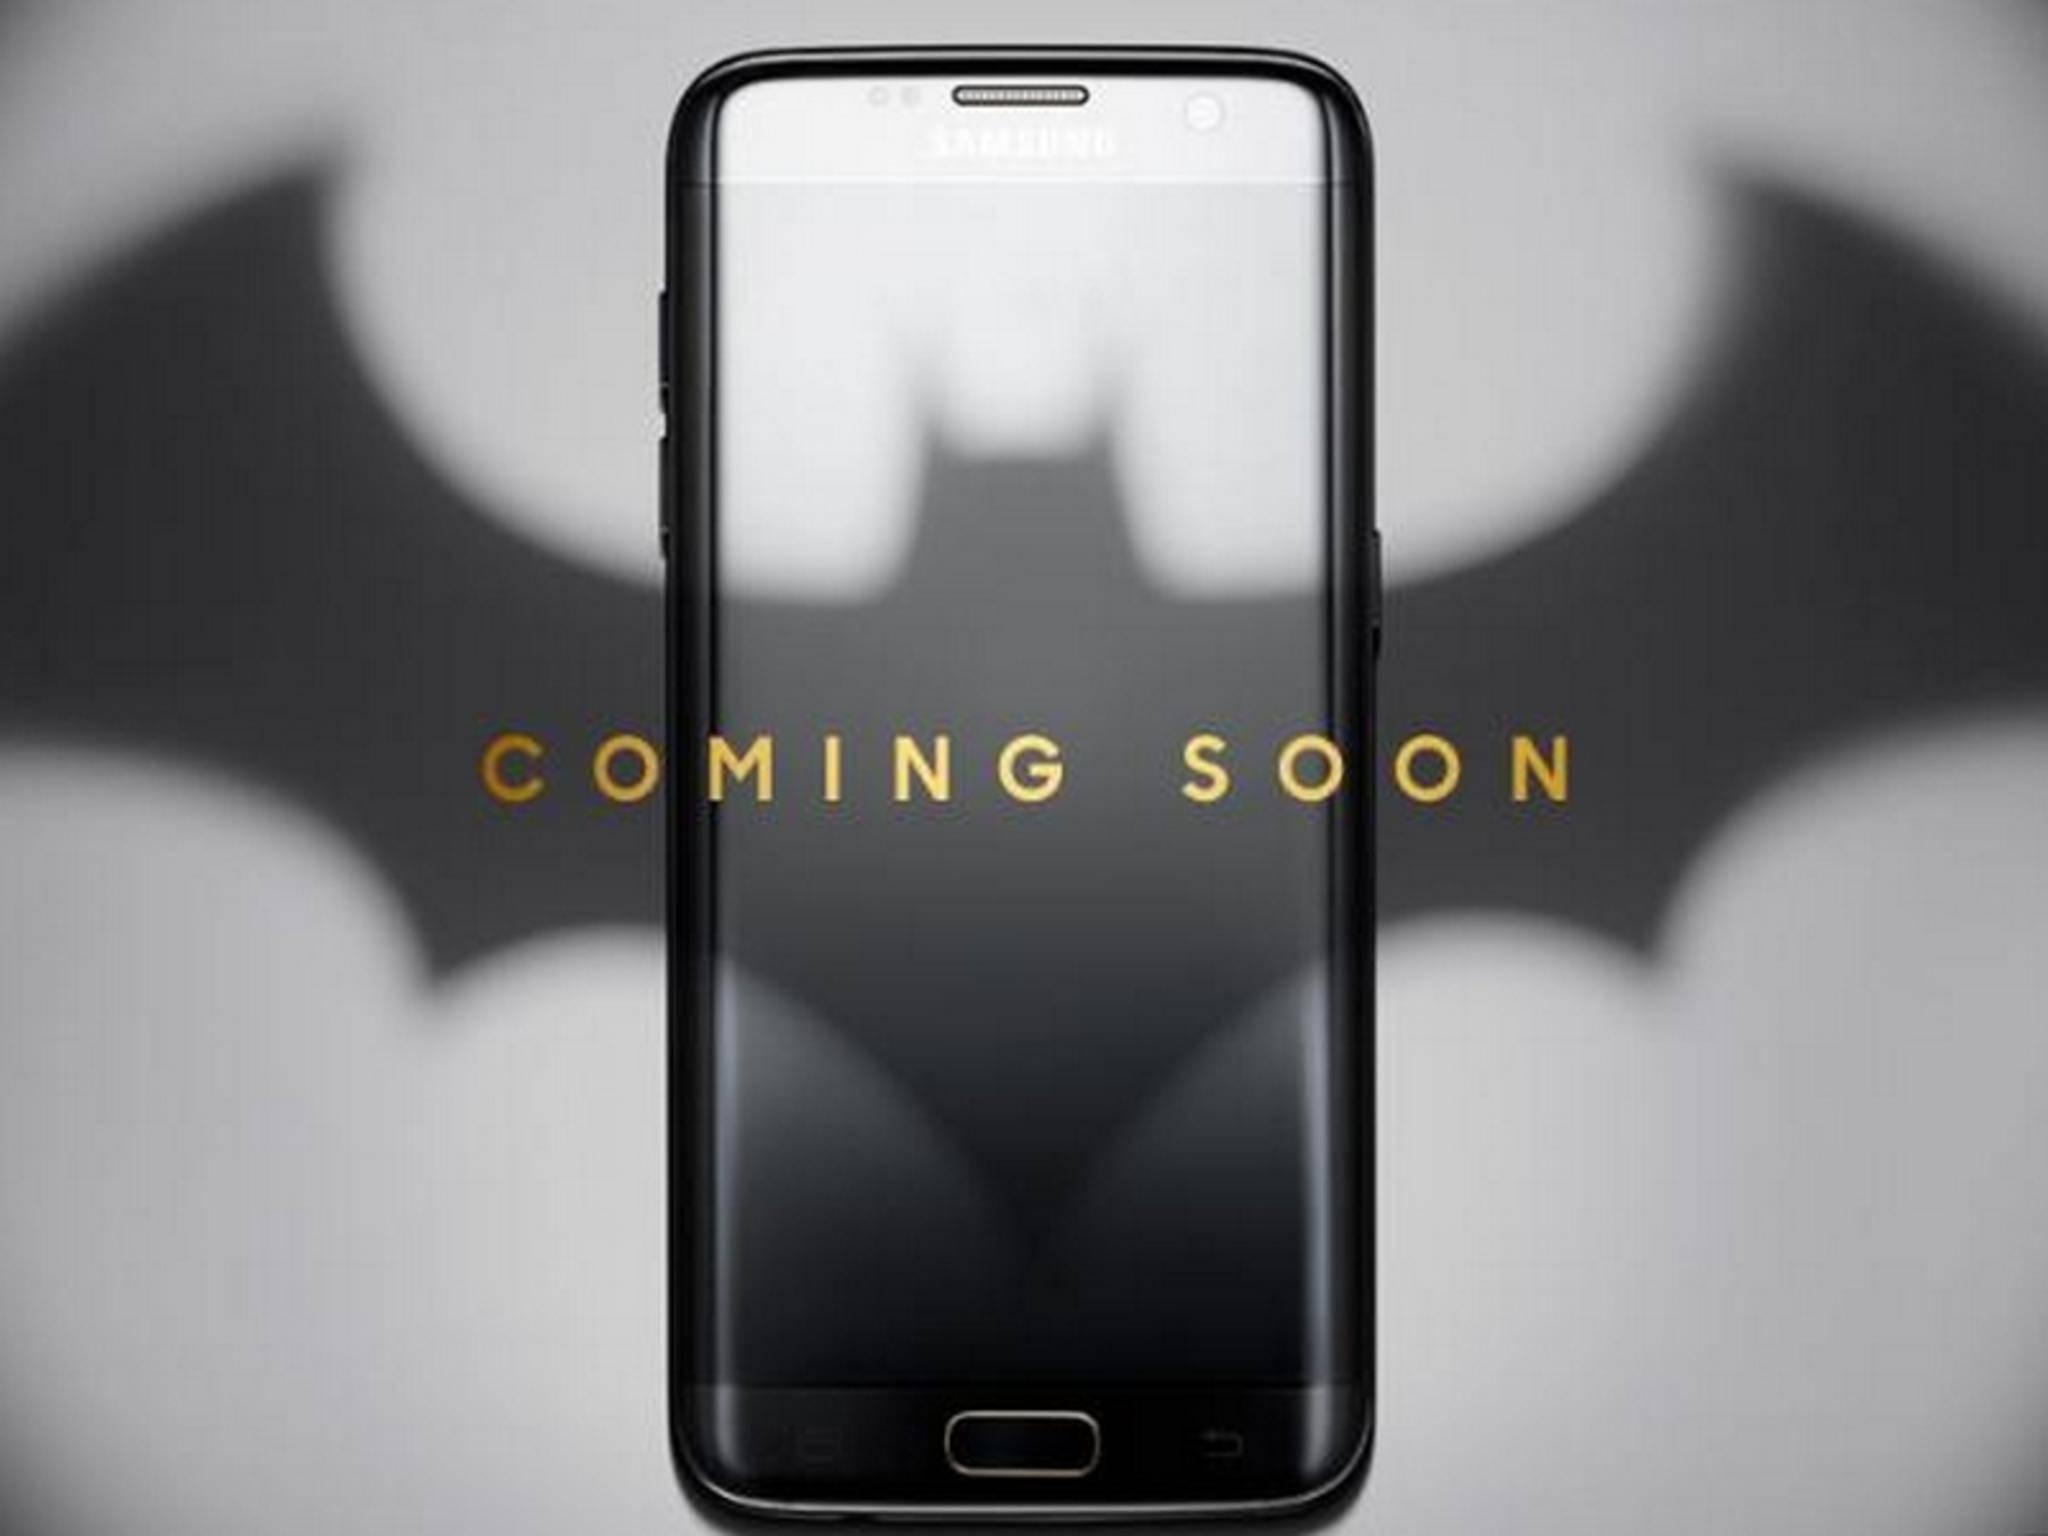 Samsung plant eine Batman-Edition des Galaxy S7 Edge.